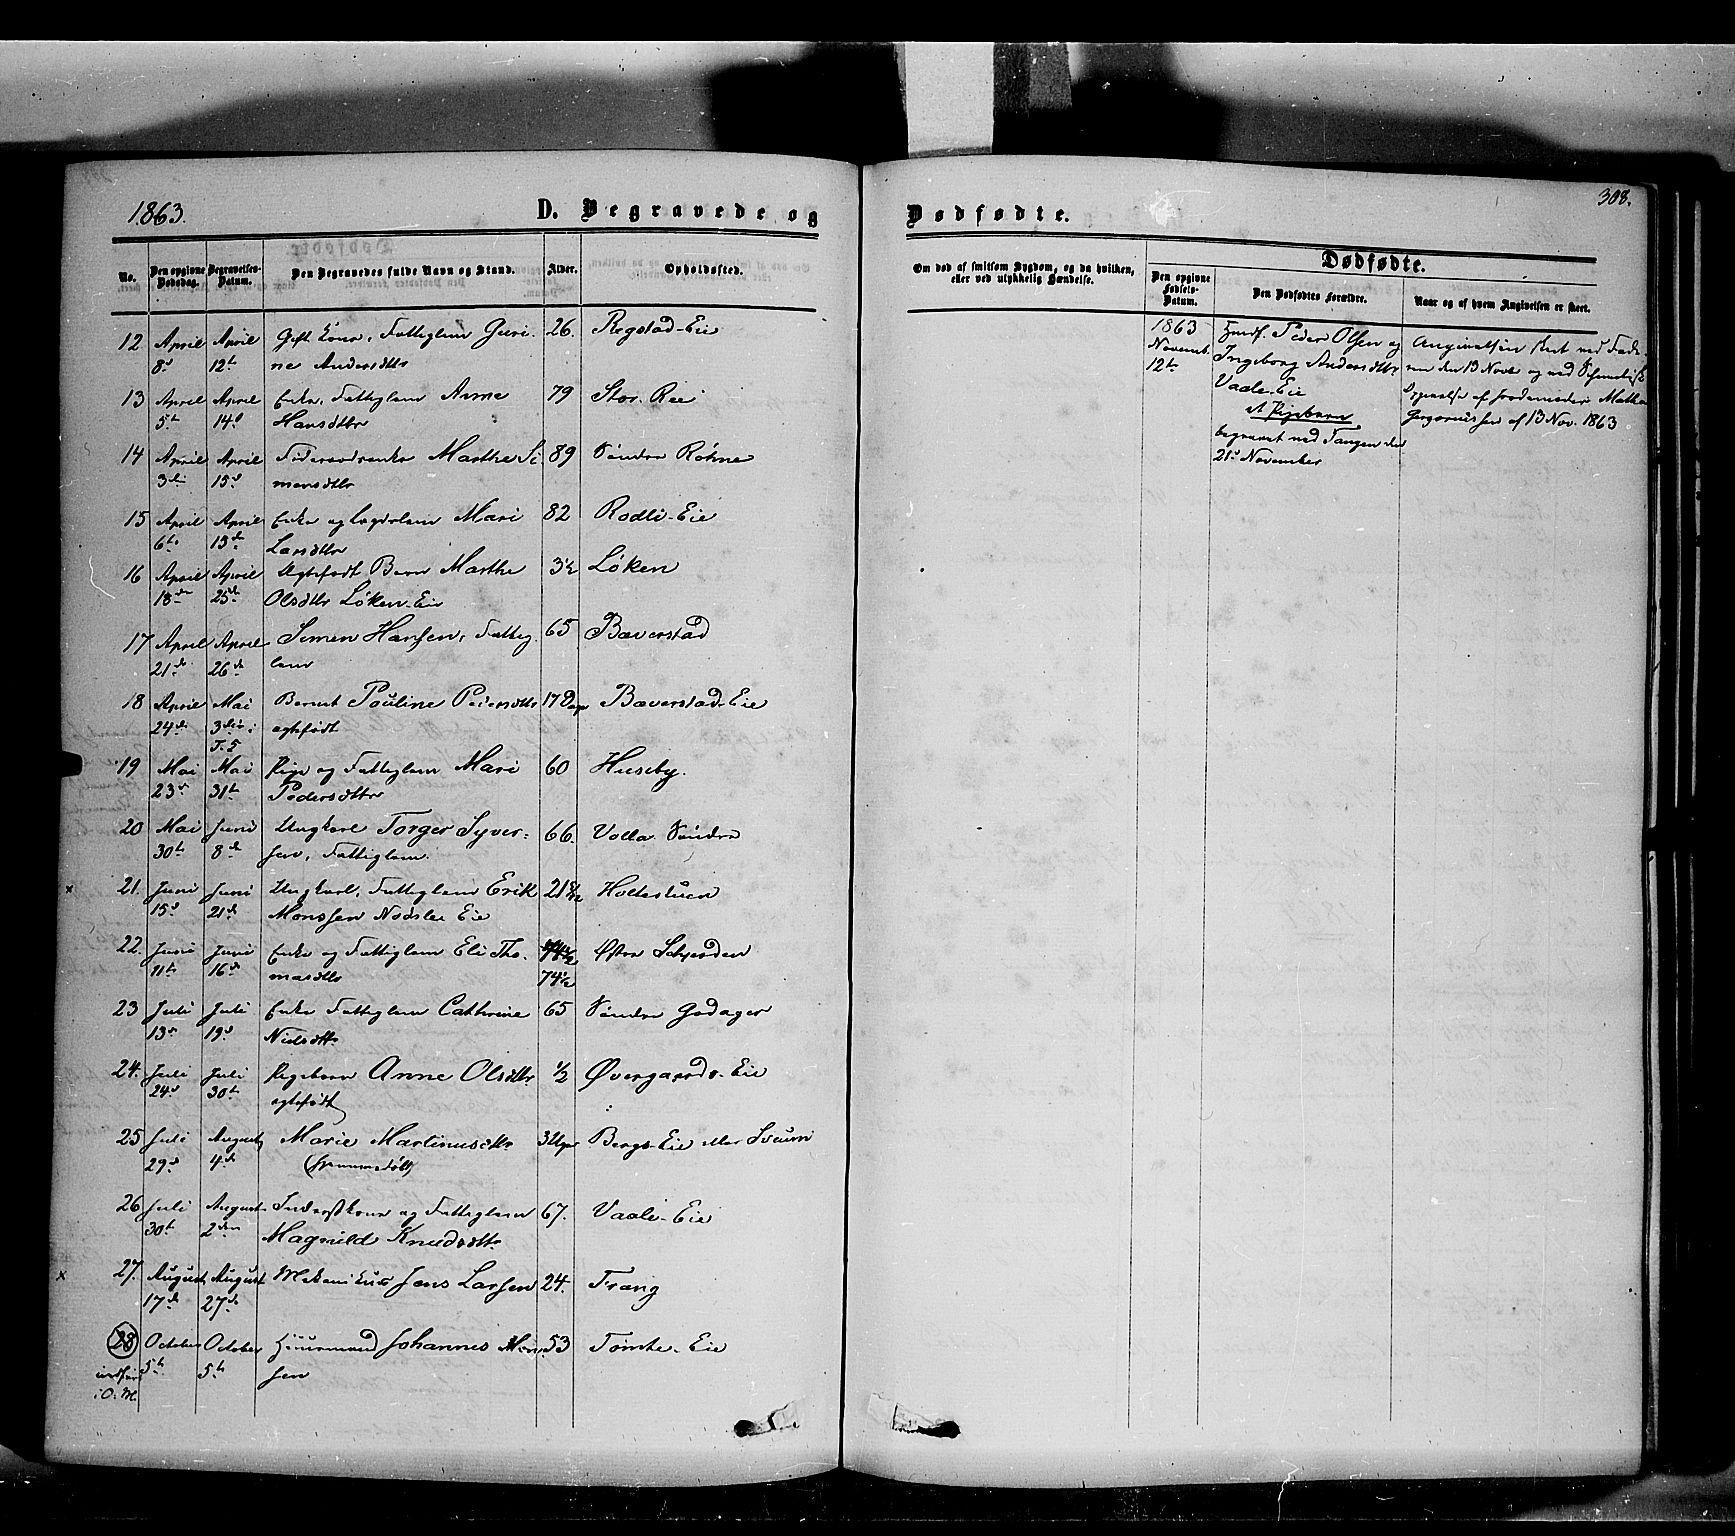 SAH, Stange prestekontor, K/L0013: Ministerialbok nr. 13, 1862-1879, s. 308